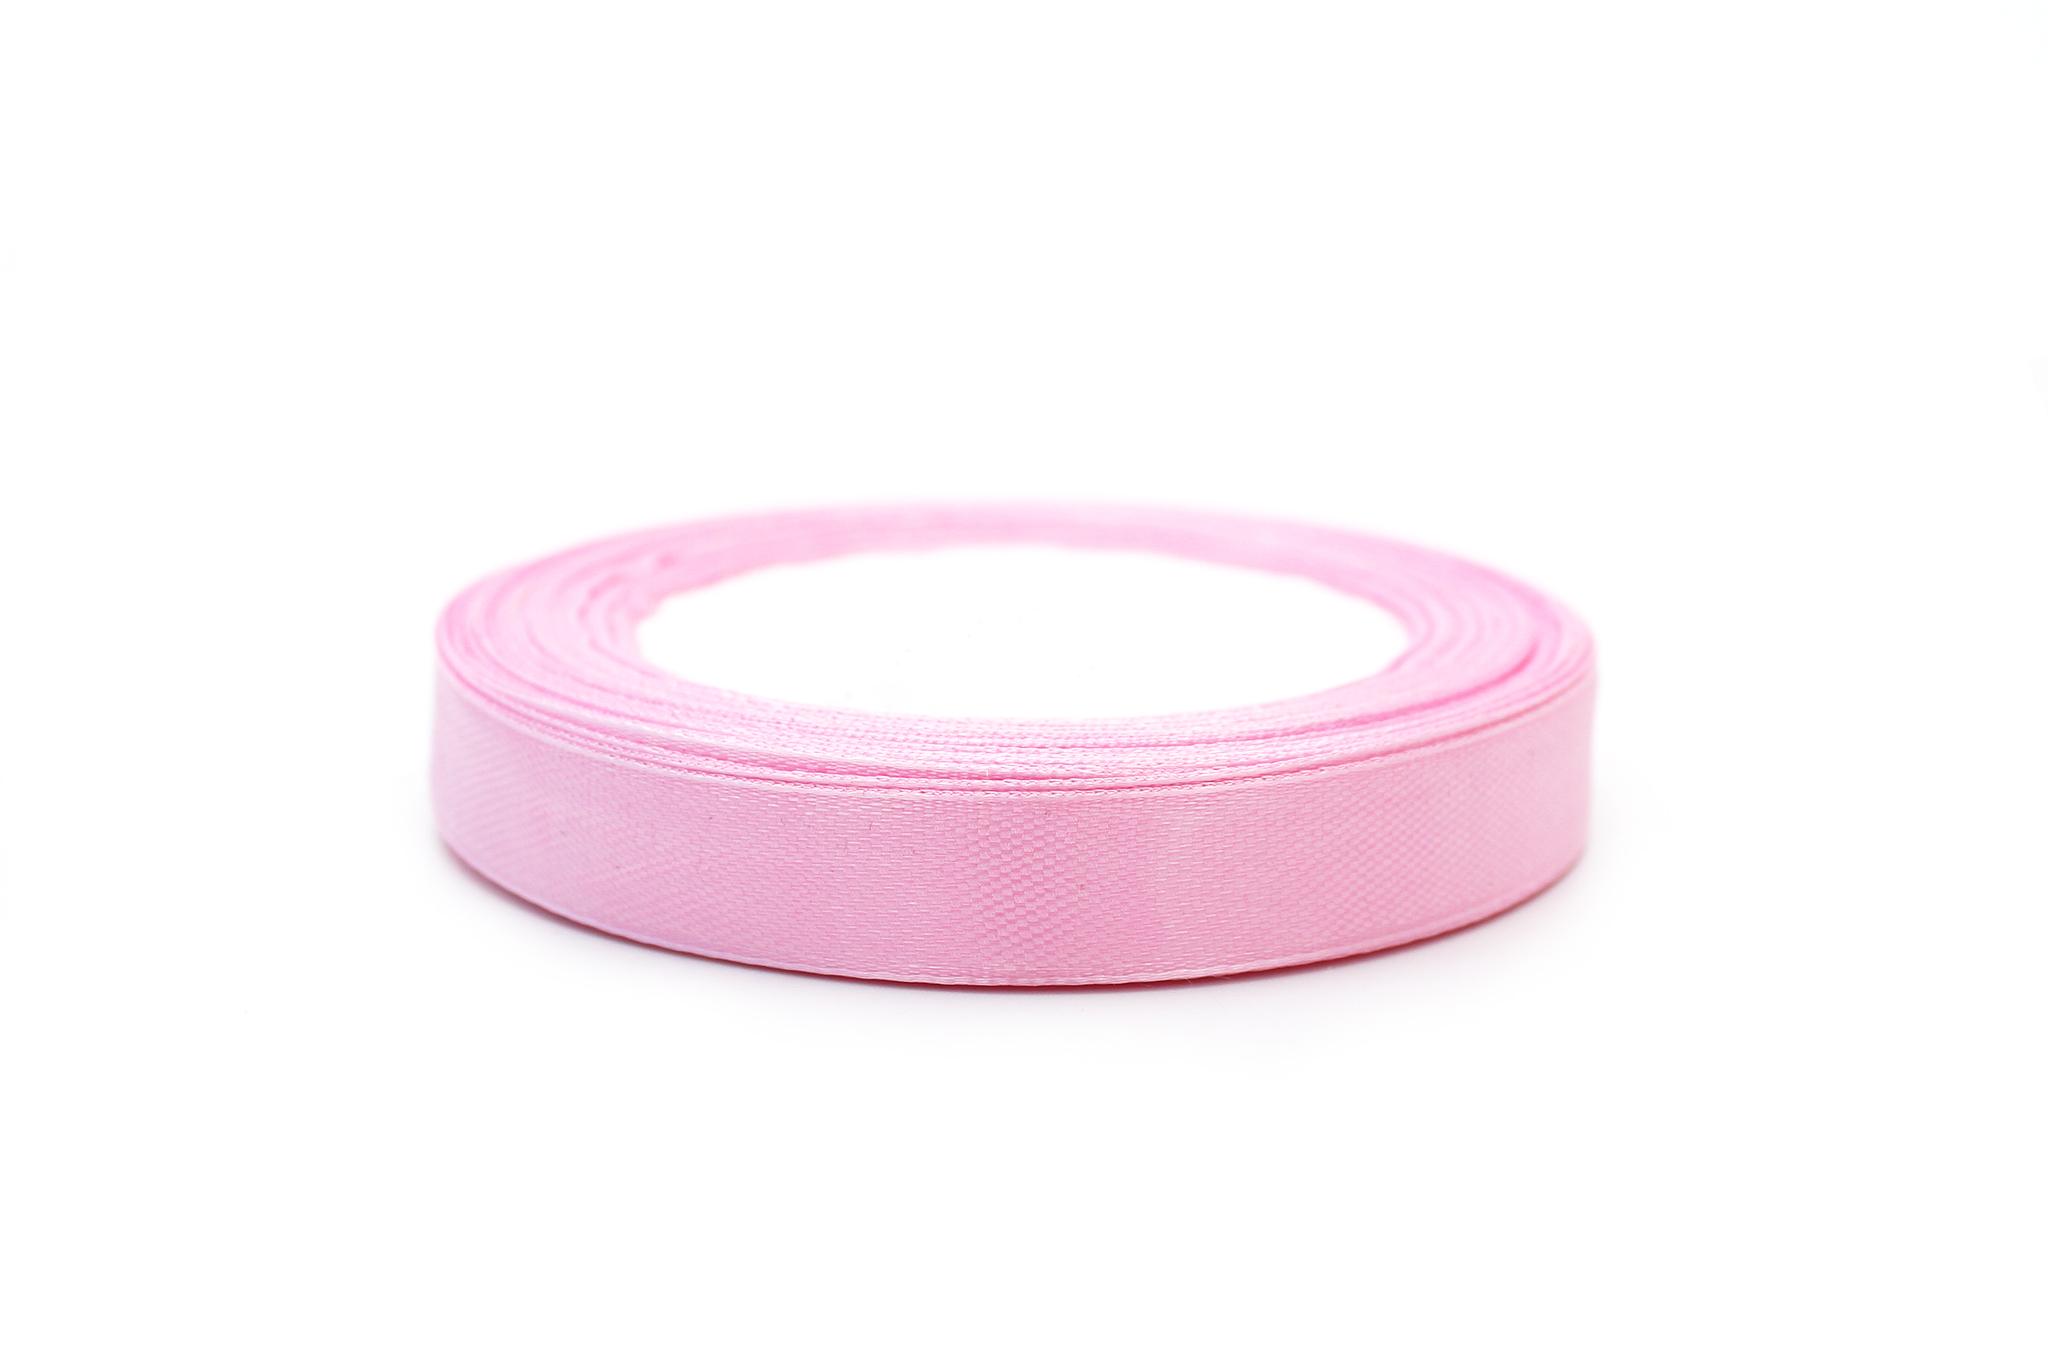 Лента атласная,1,2 см, нежно-розовый